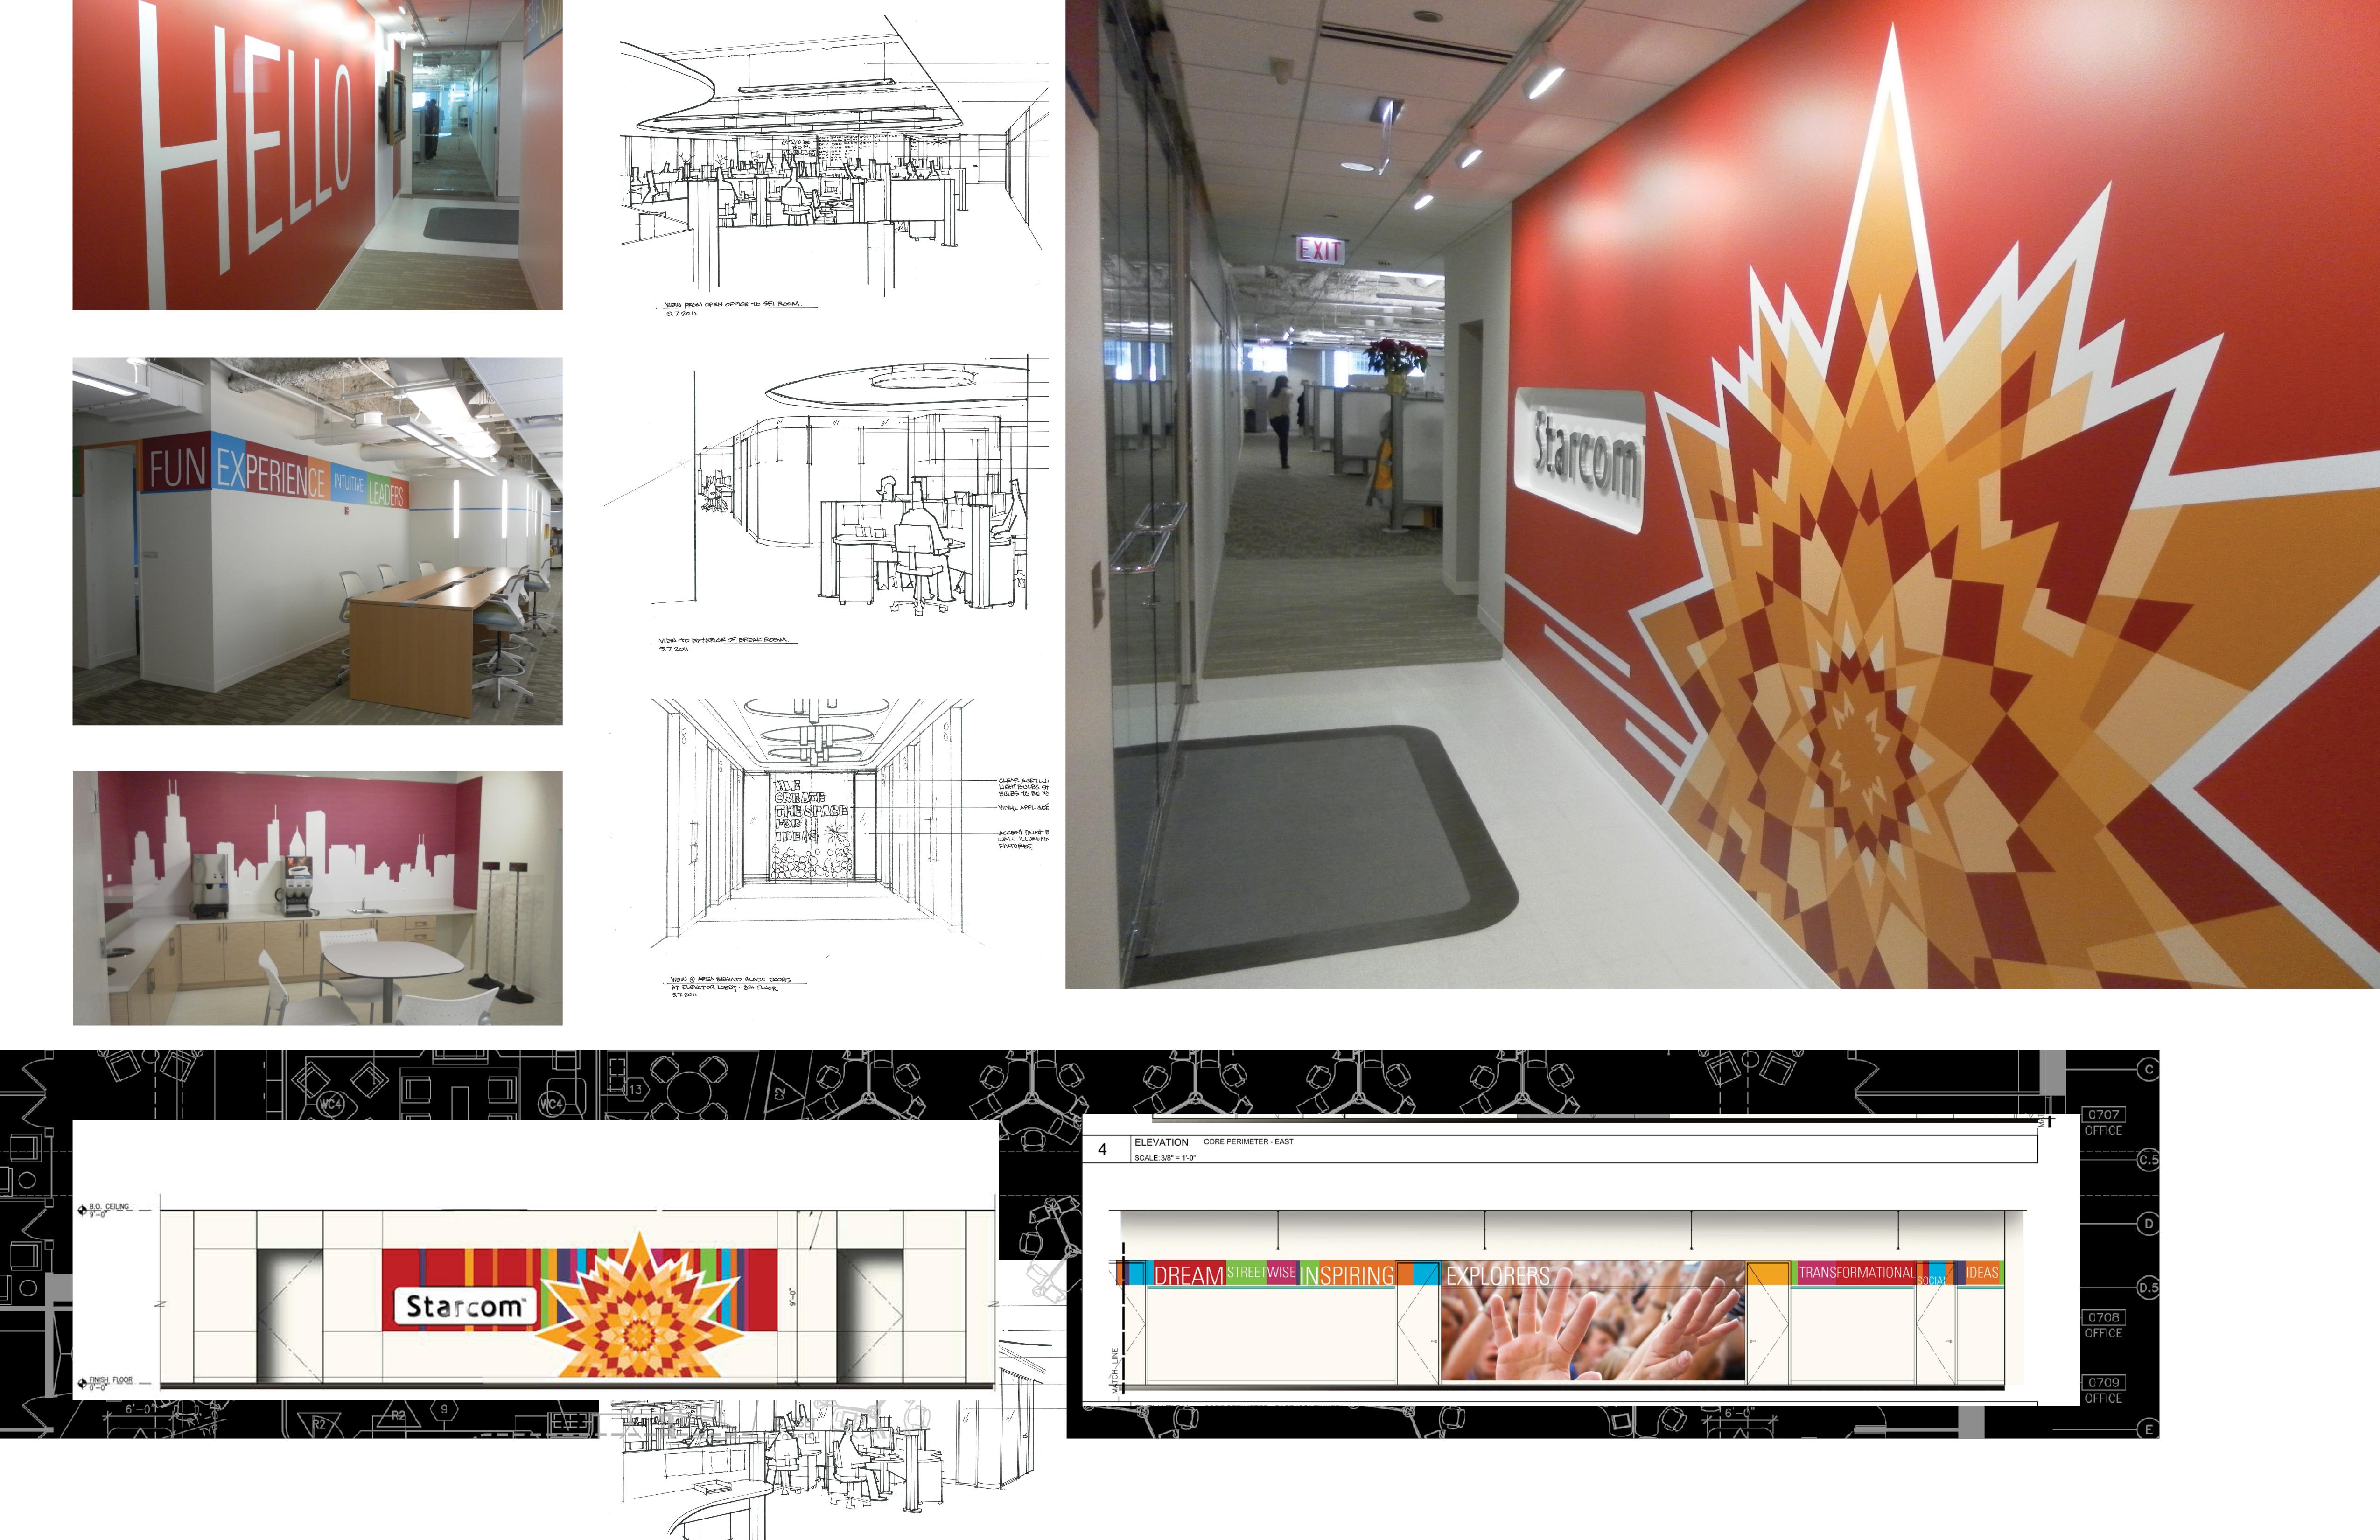 Starcom Mediavest Interior Design Steven Ohlhaber Studios